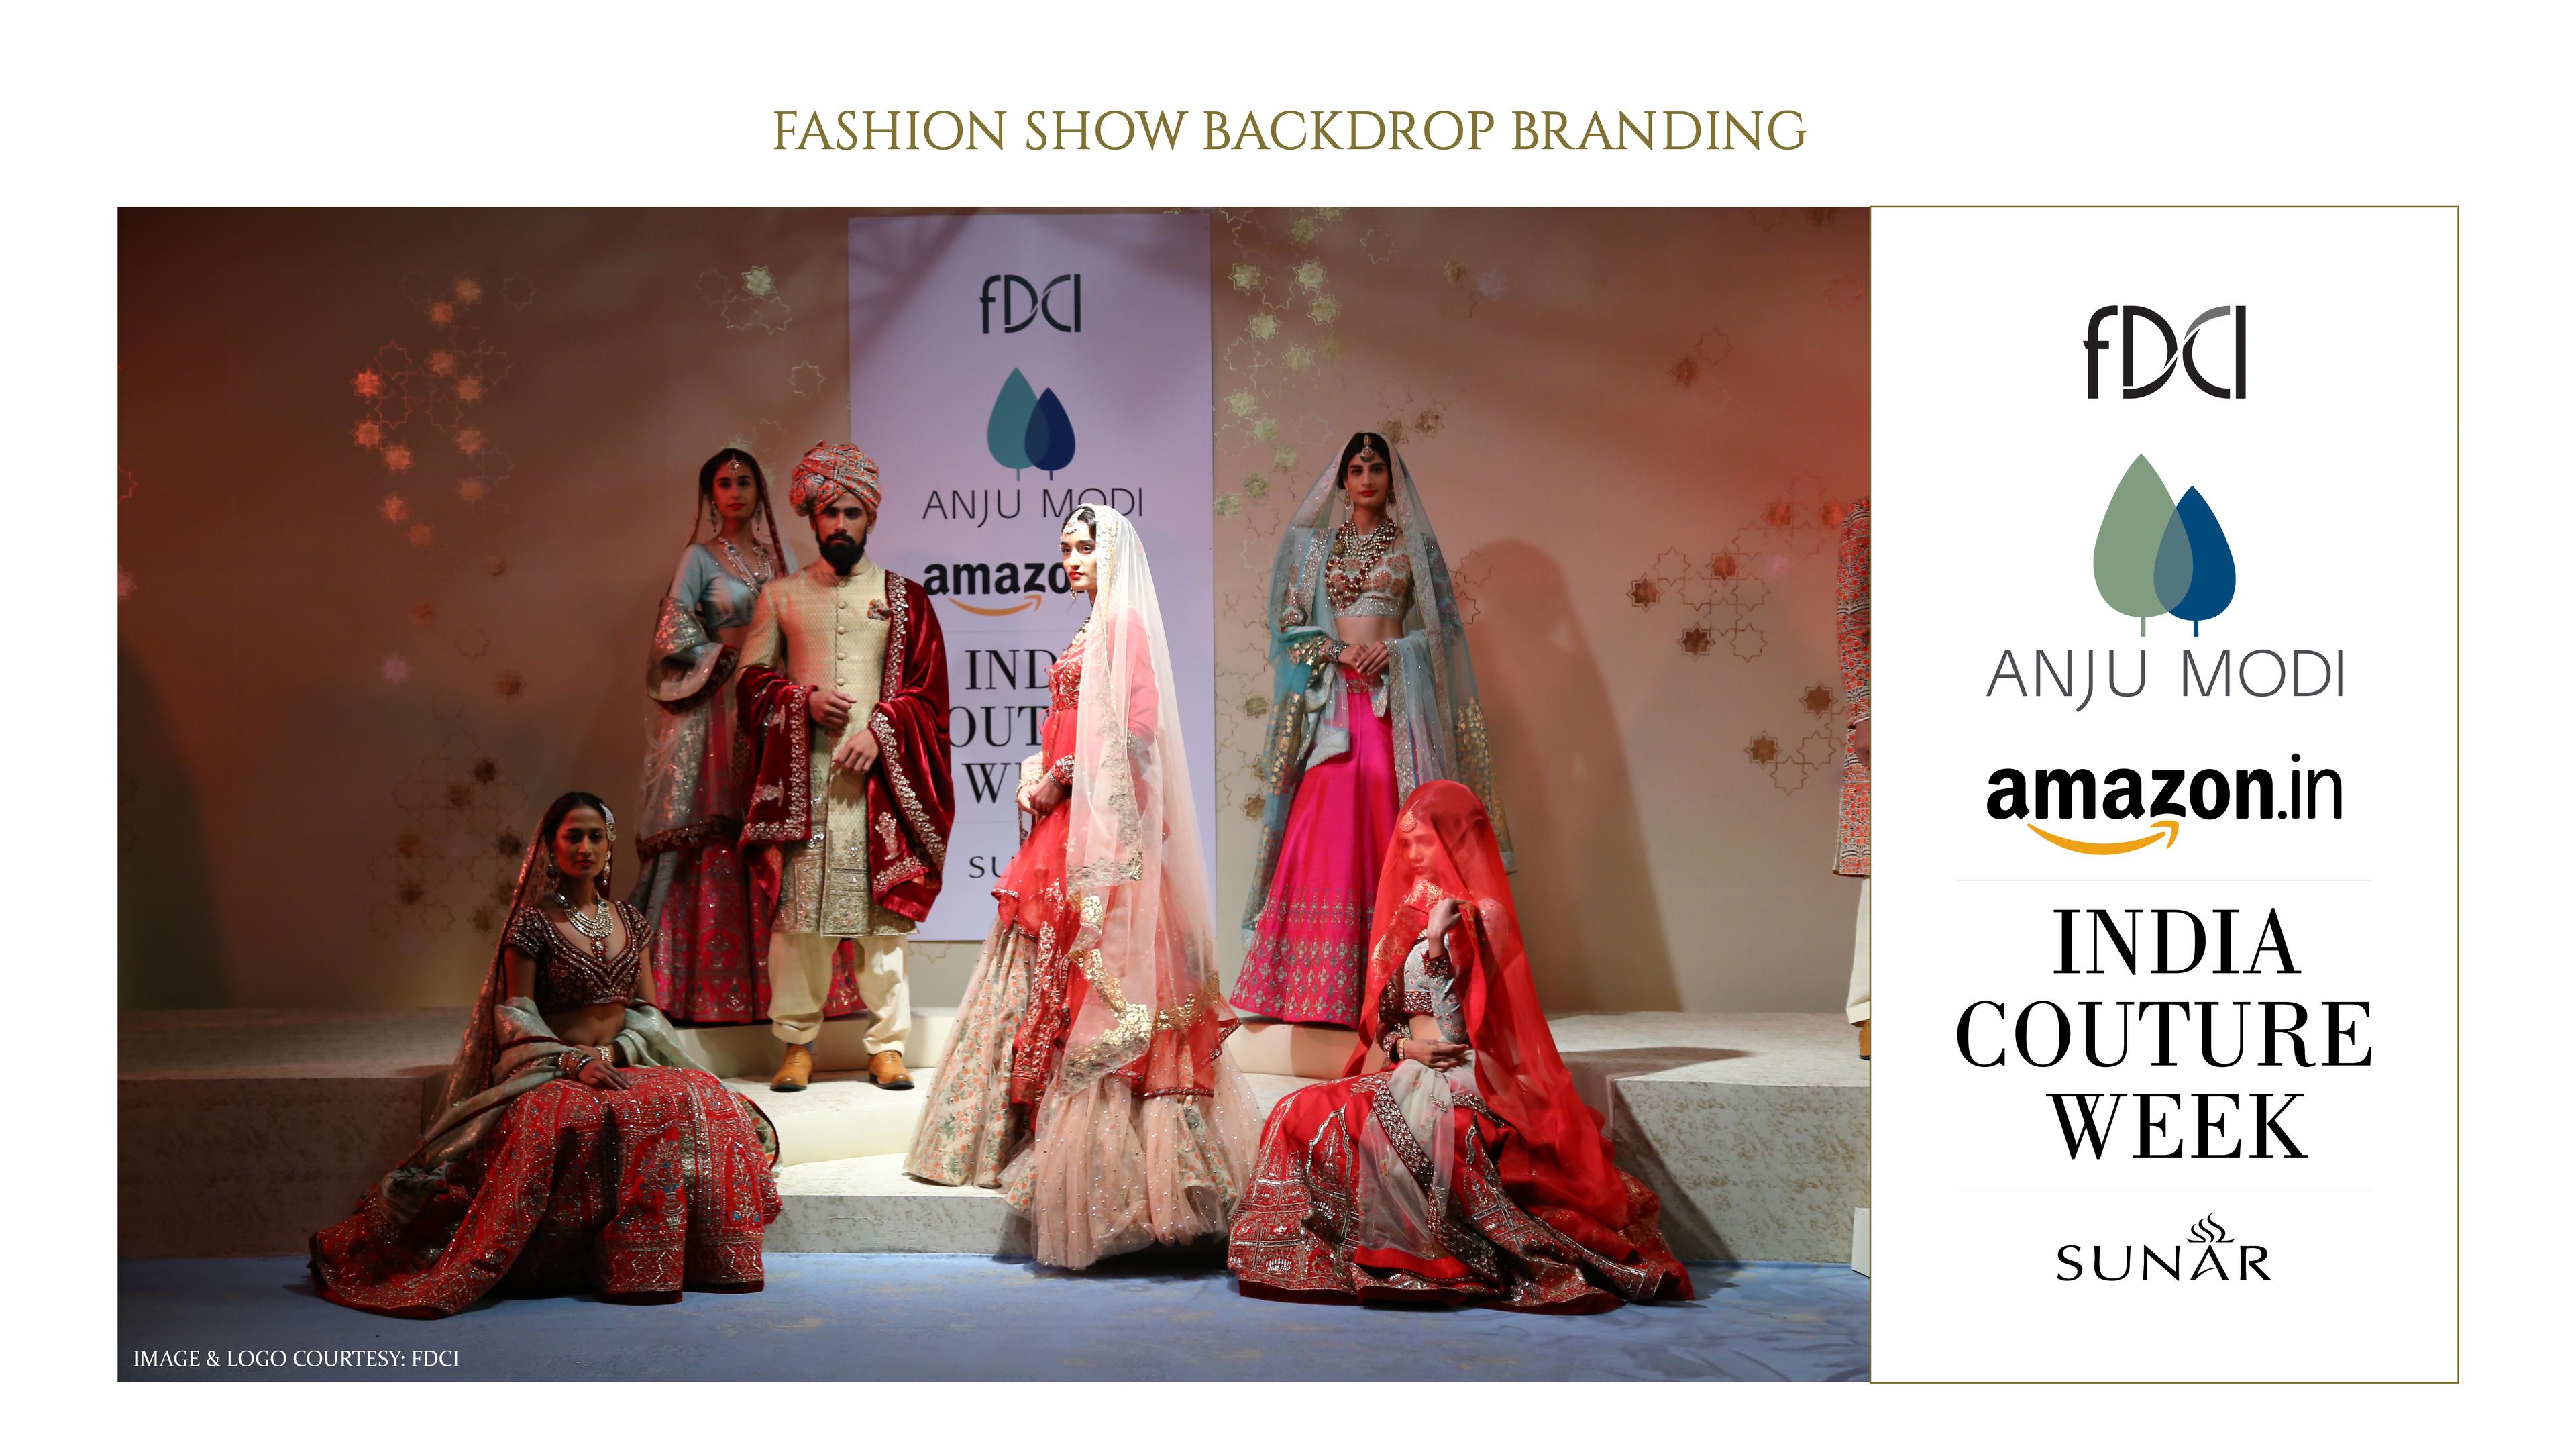 Fashion Show Backdrop Branding